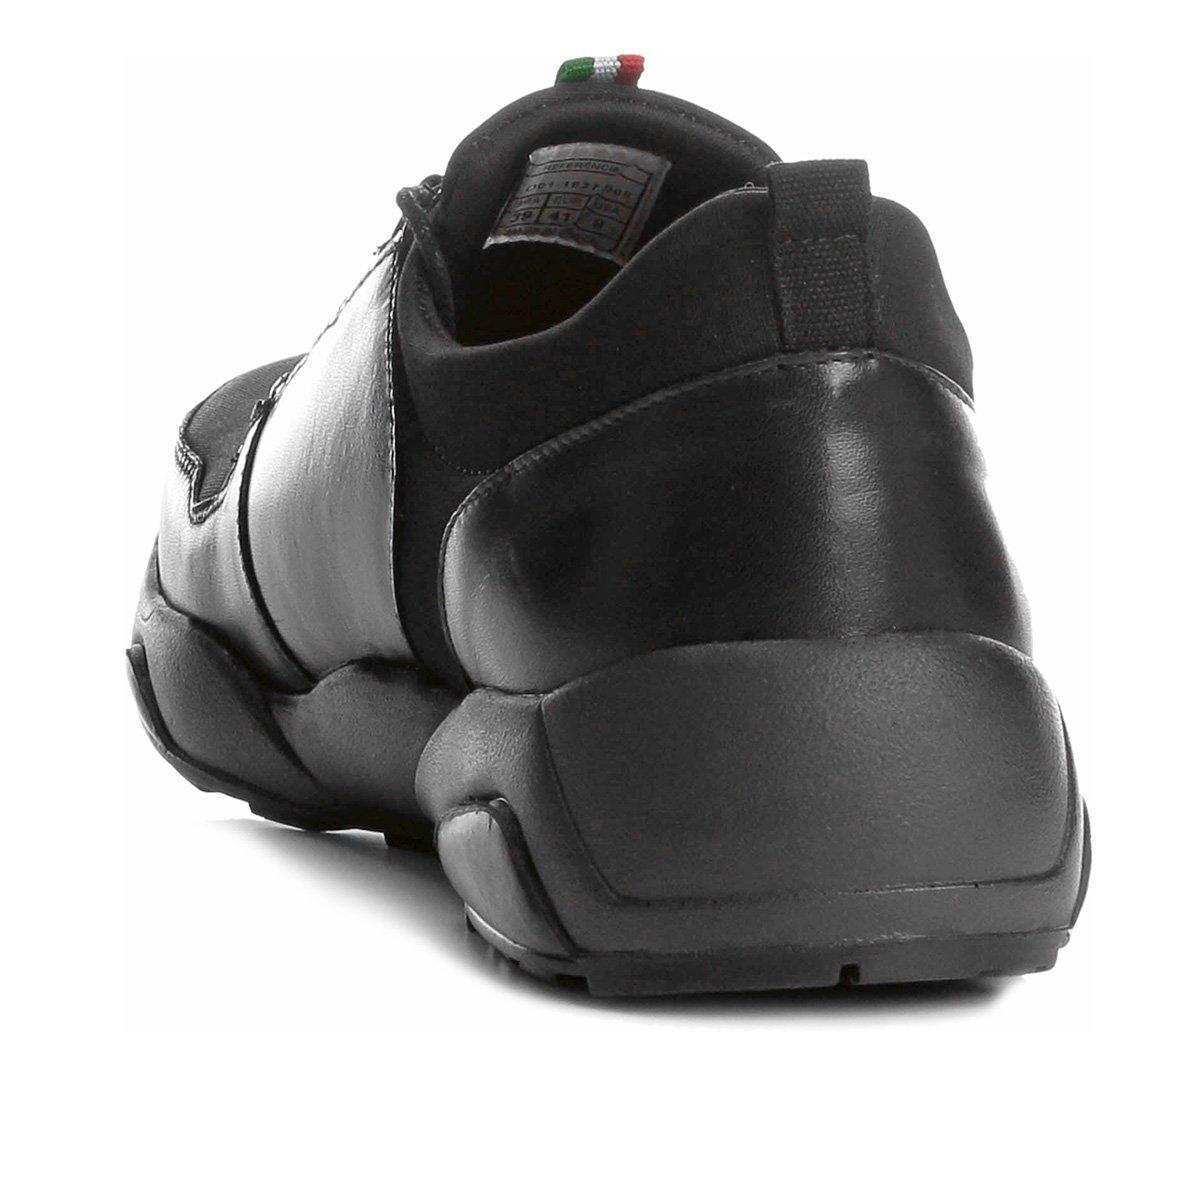 4b8662a9eb Tênis Couro Shoestock Jogging Neoprene Masculino - Shopping TudoAzul